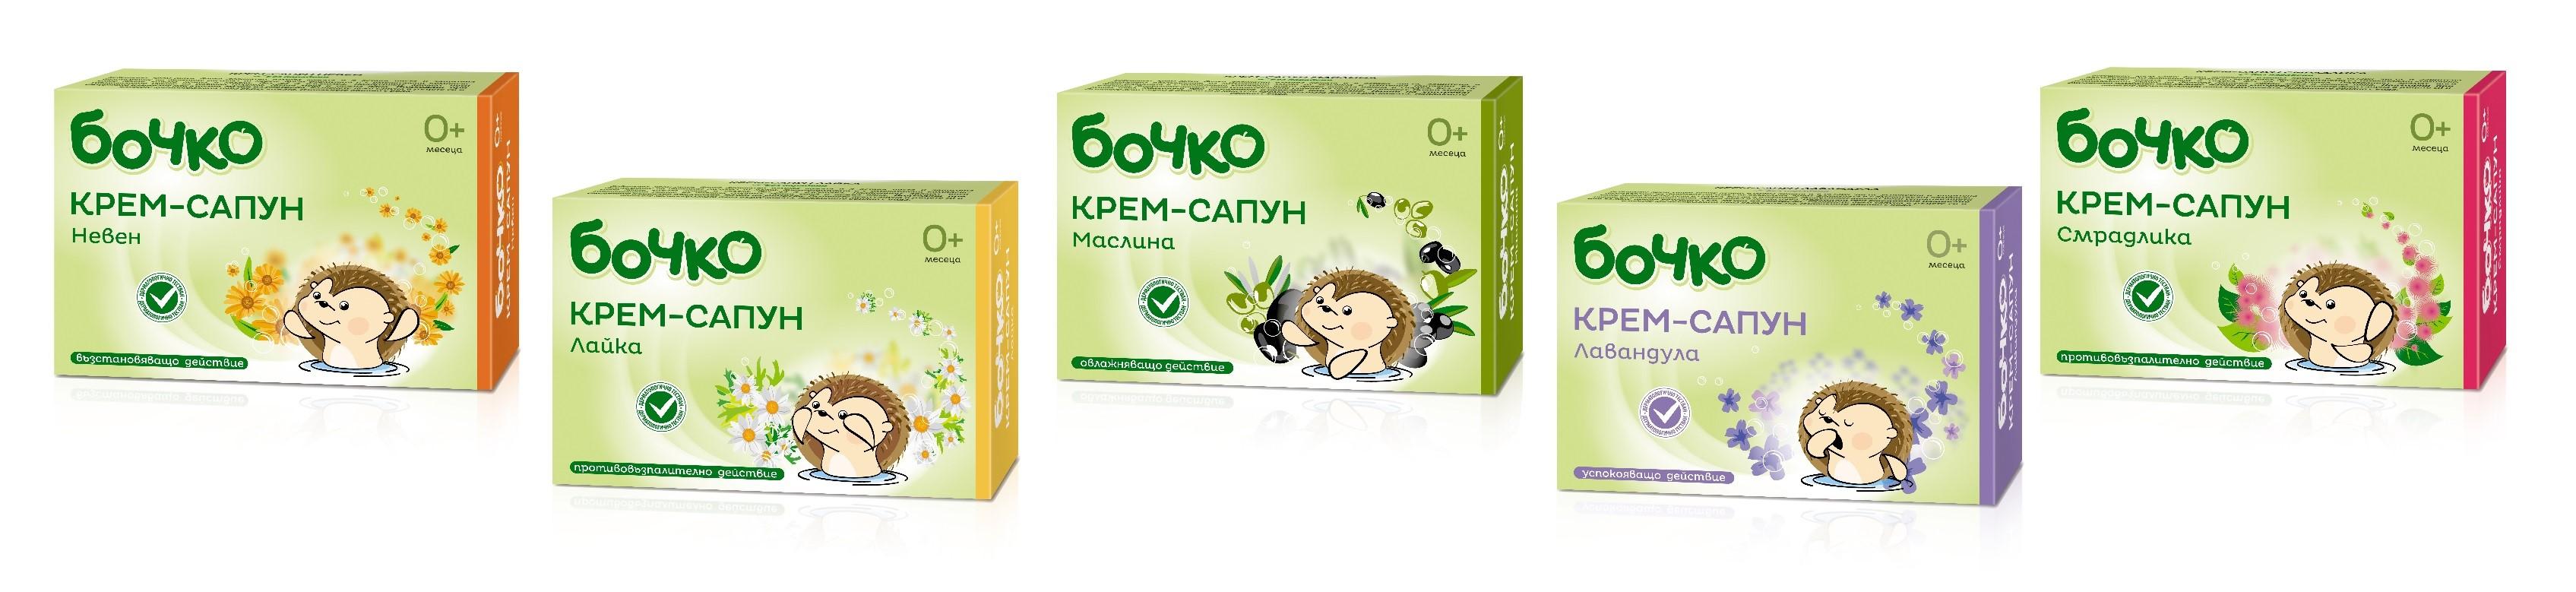 Bochko Krem Sapun 5 scents